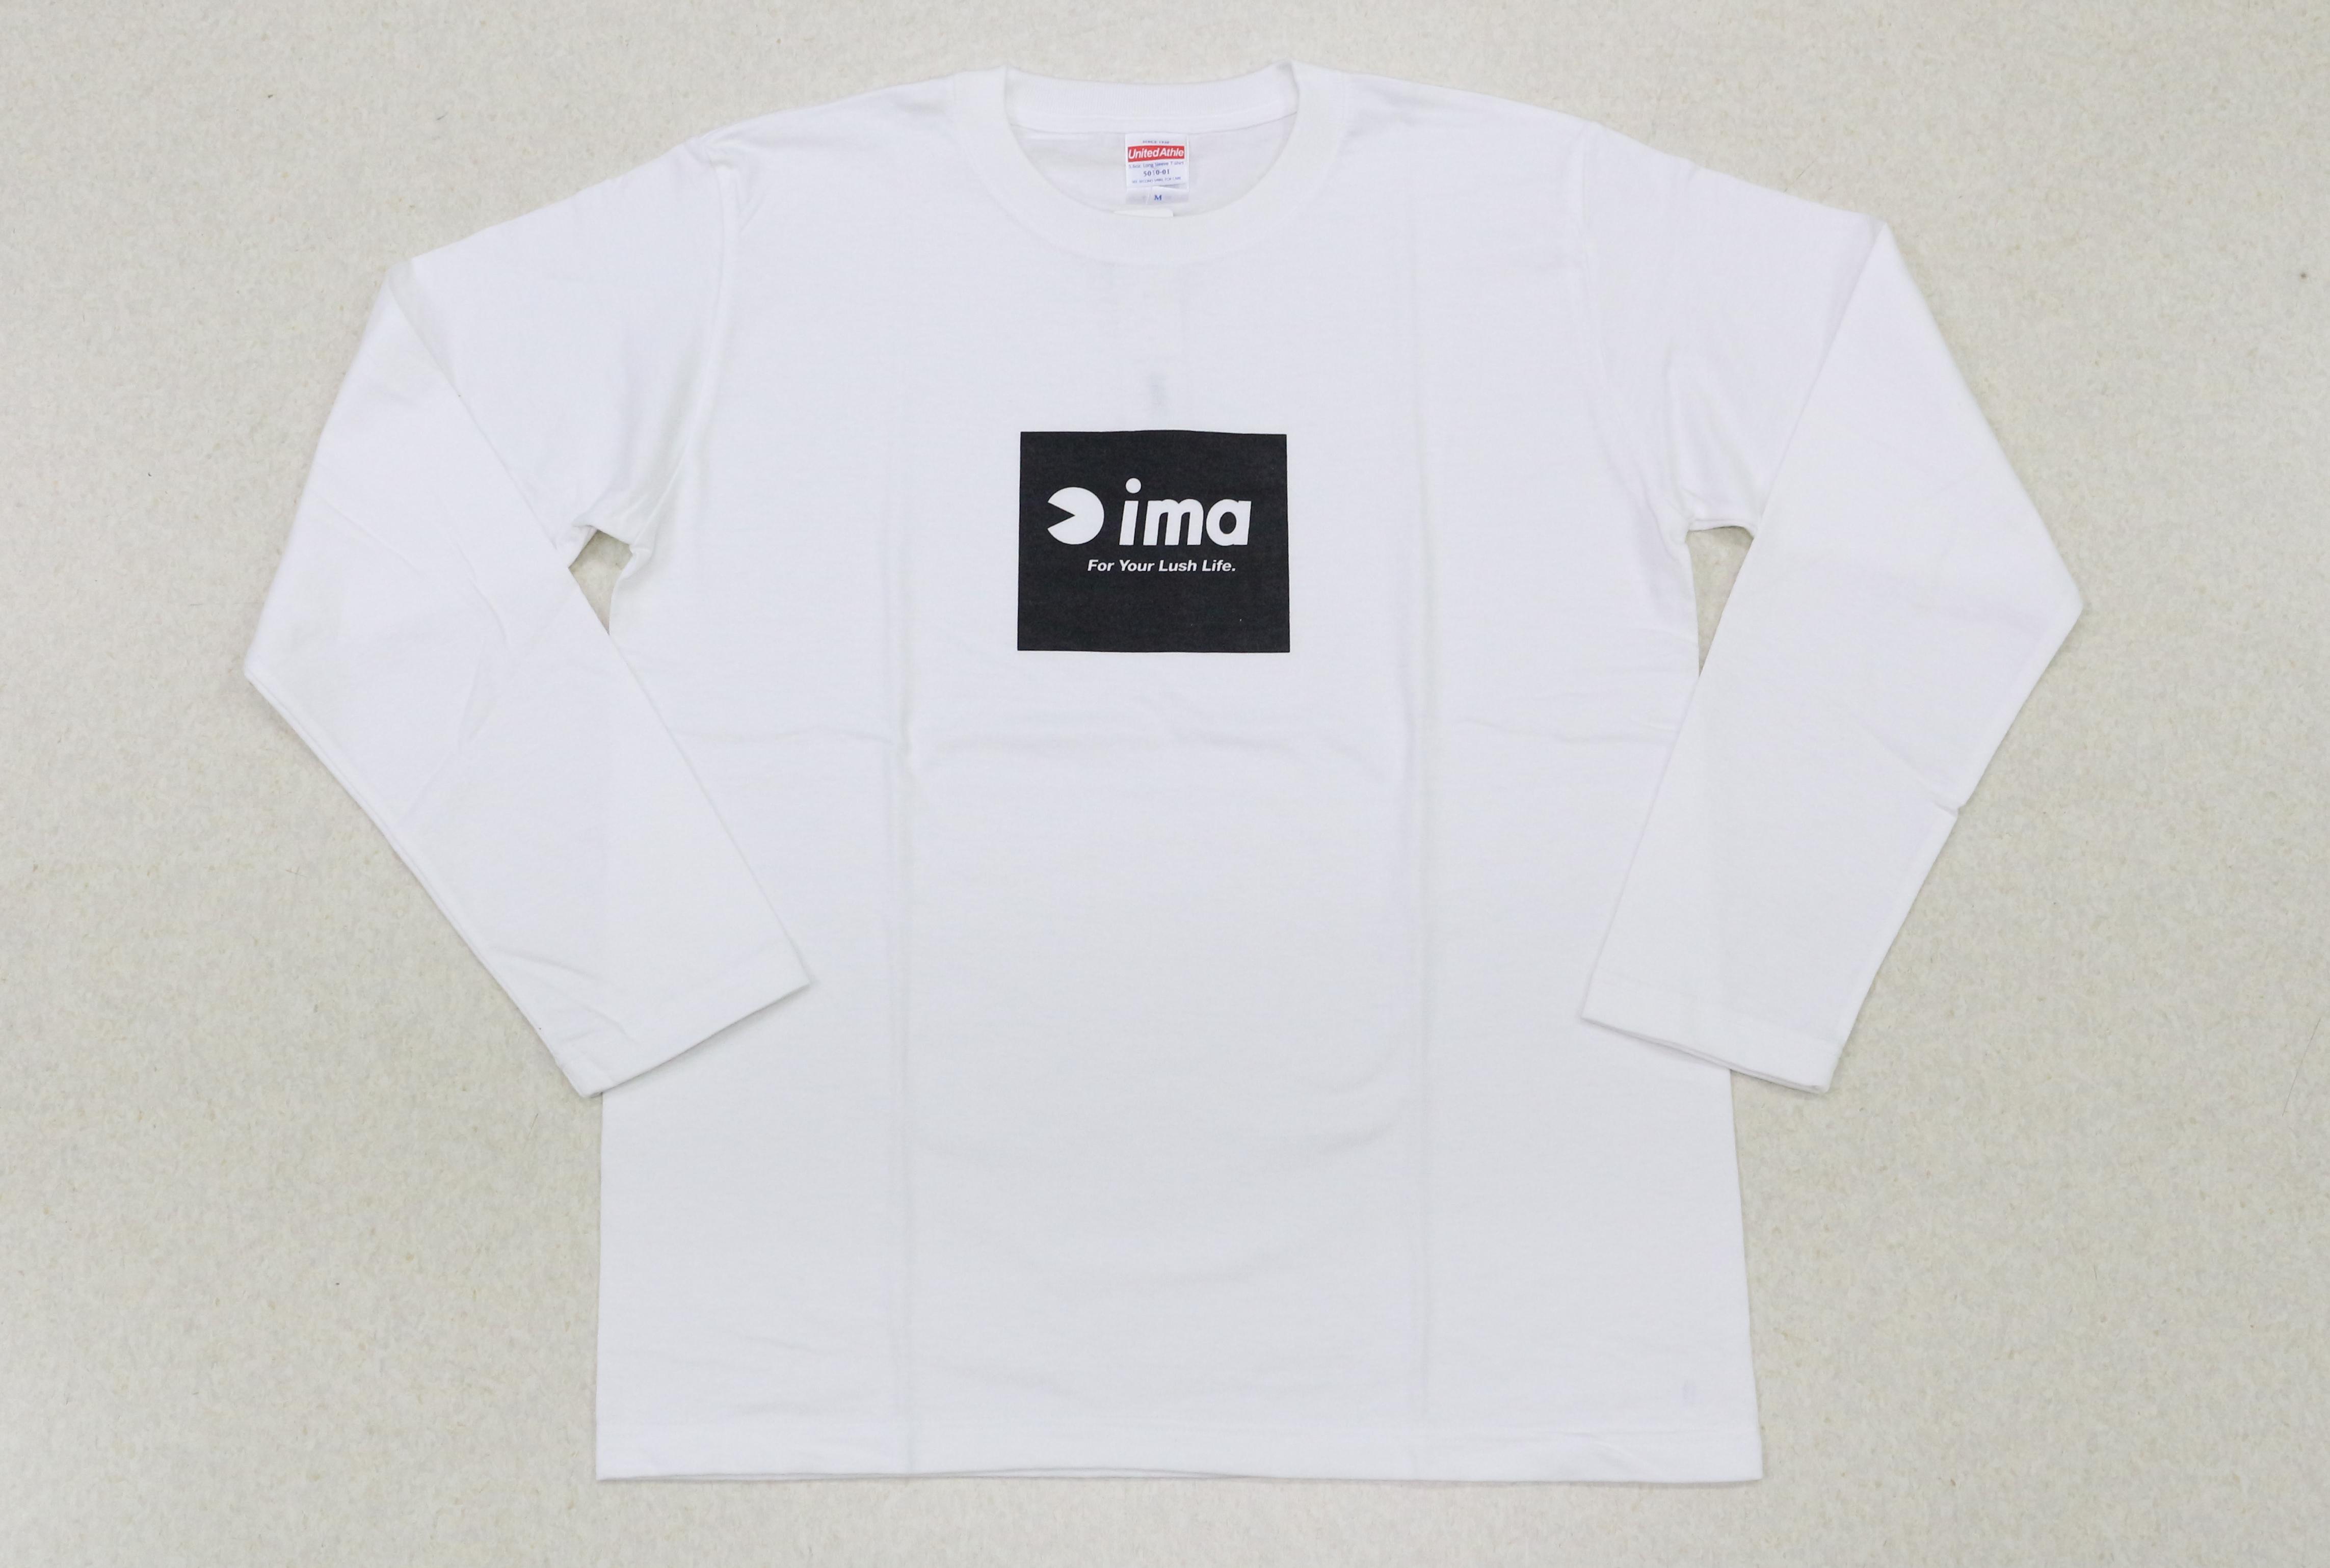 Sale Ima T Shirt Long Sleeve Box Logo White Size XL (6910)